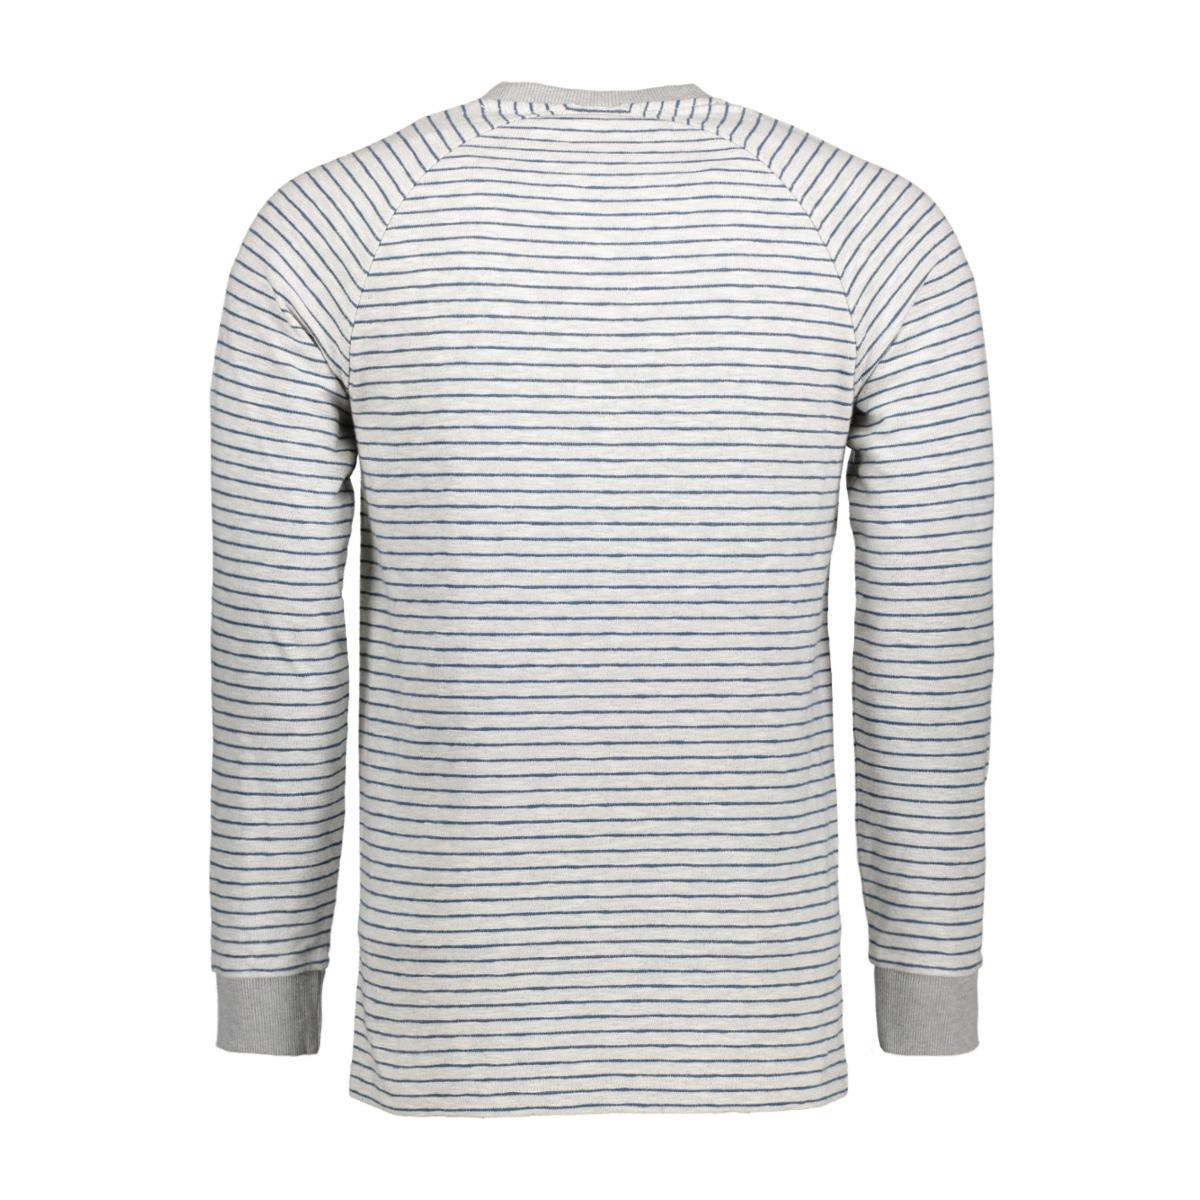 cts175307 cast iron sweater 9031